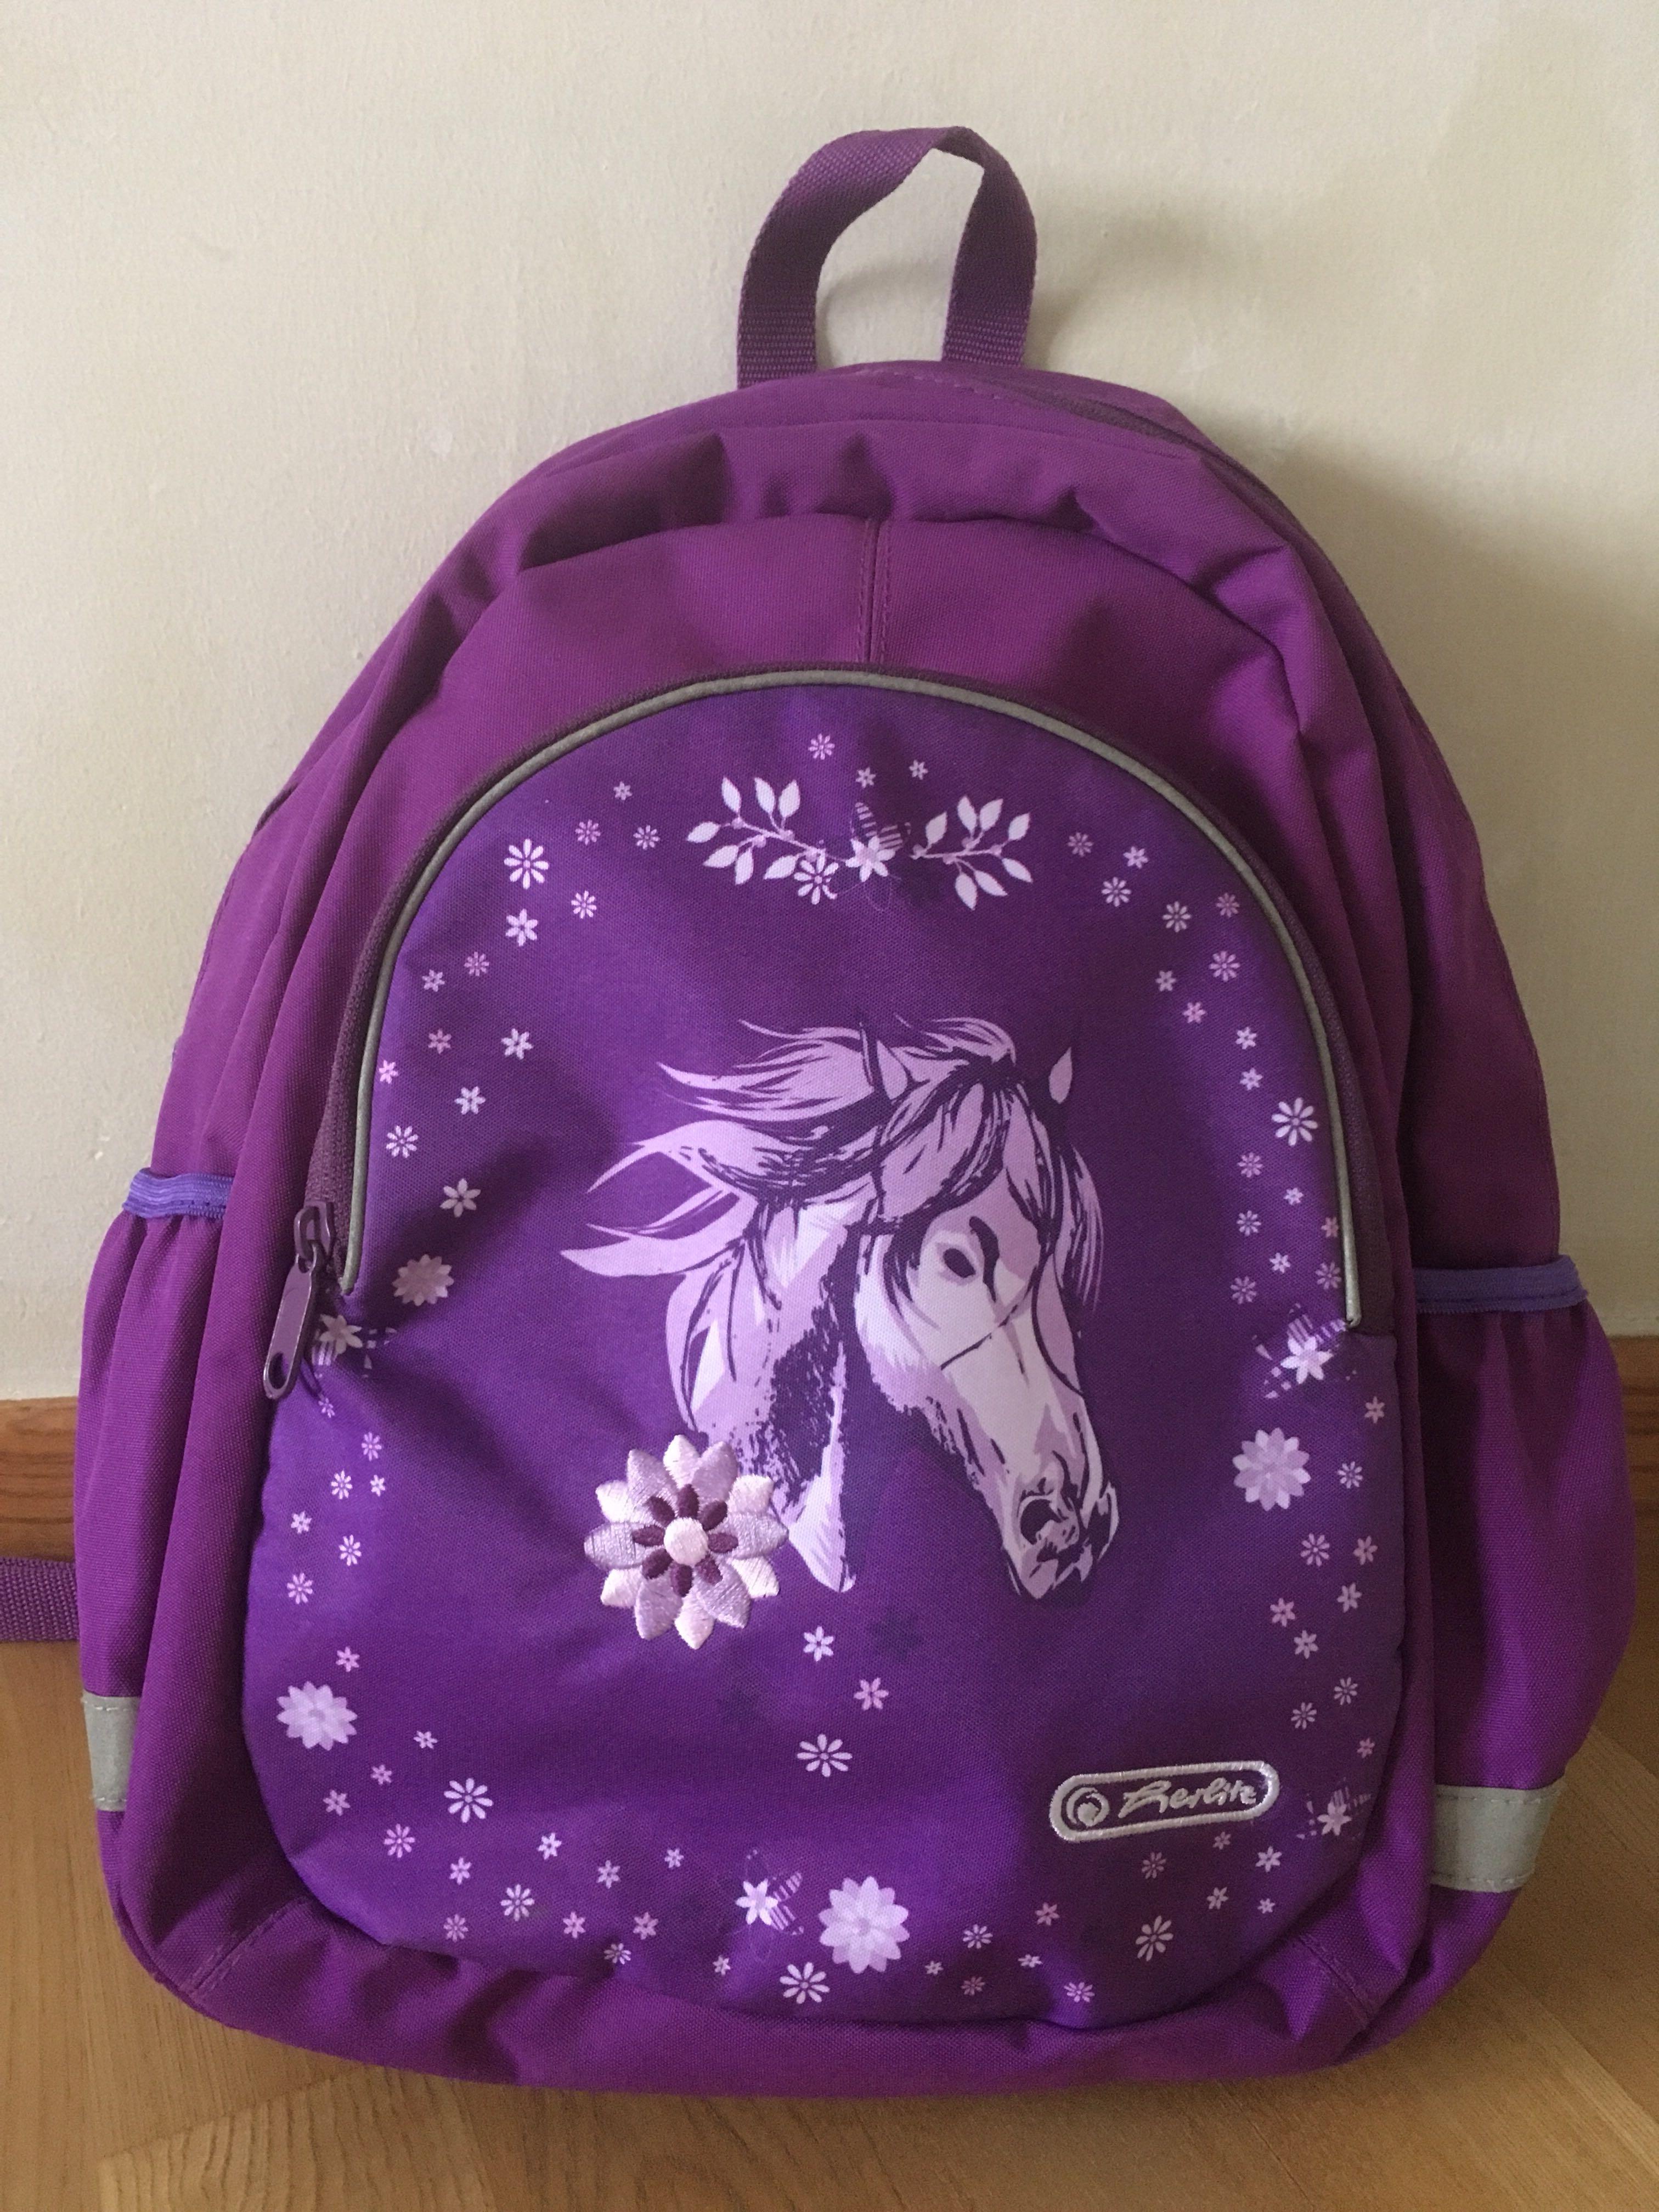 feafd6c1d8 Herlitz Kids Backpack